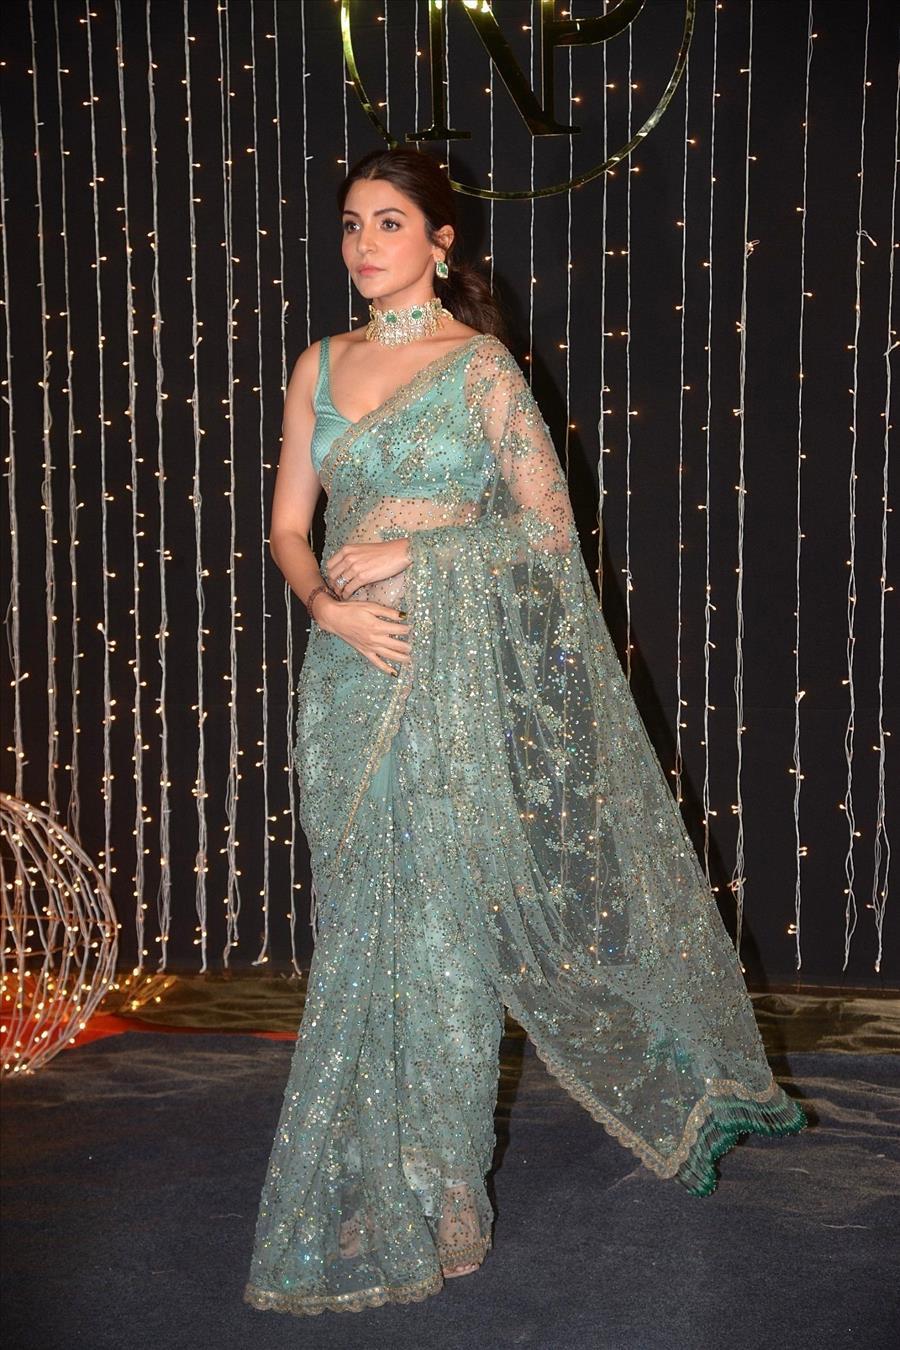 Glamorous Indian Model Anushka Sharma In Green Saree